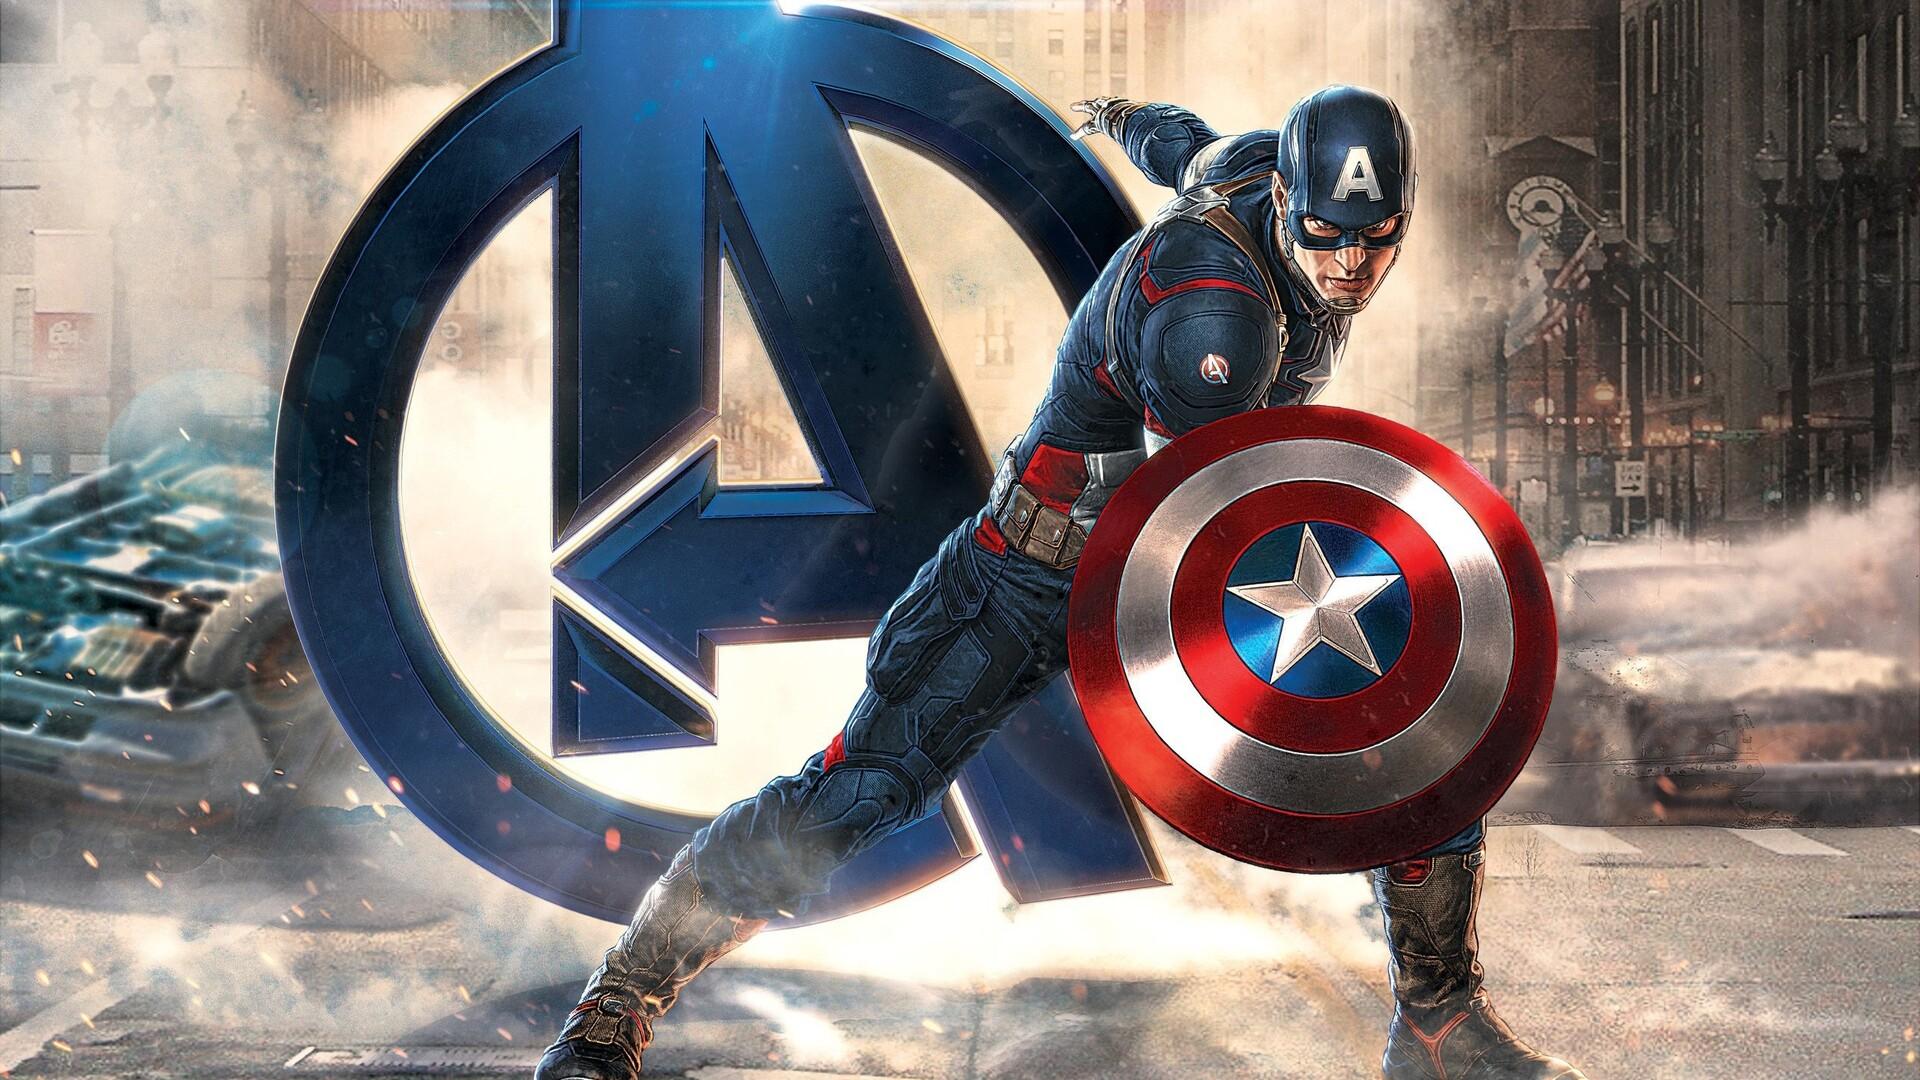 1920x1080 Captain America Avengers Laptop Full Hd 1080p Hd 4k